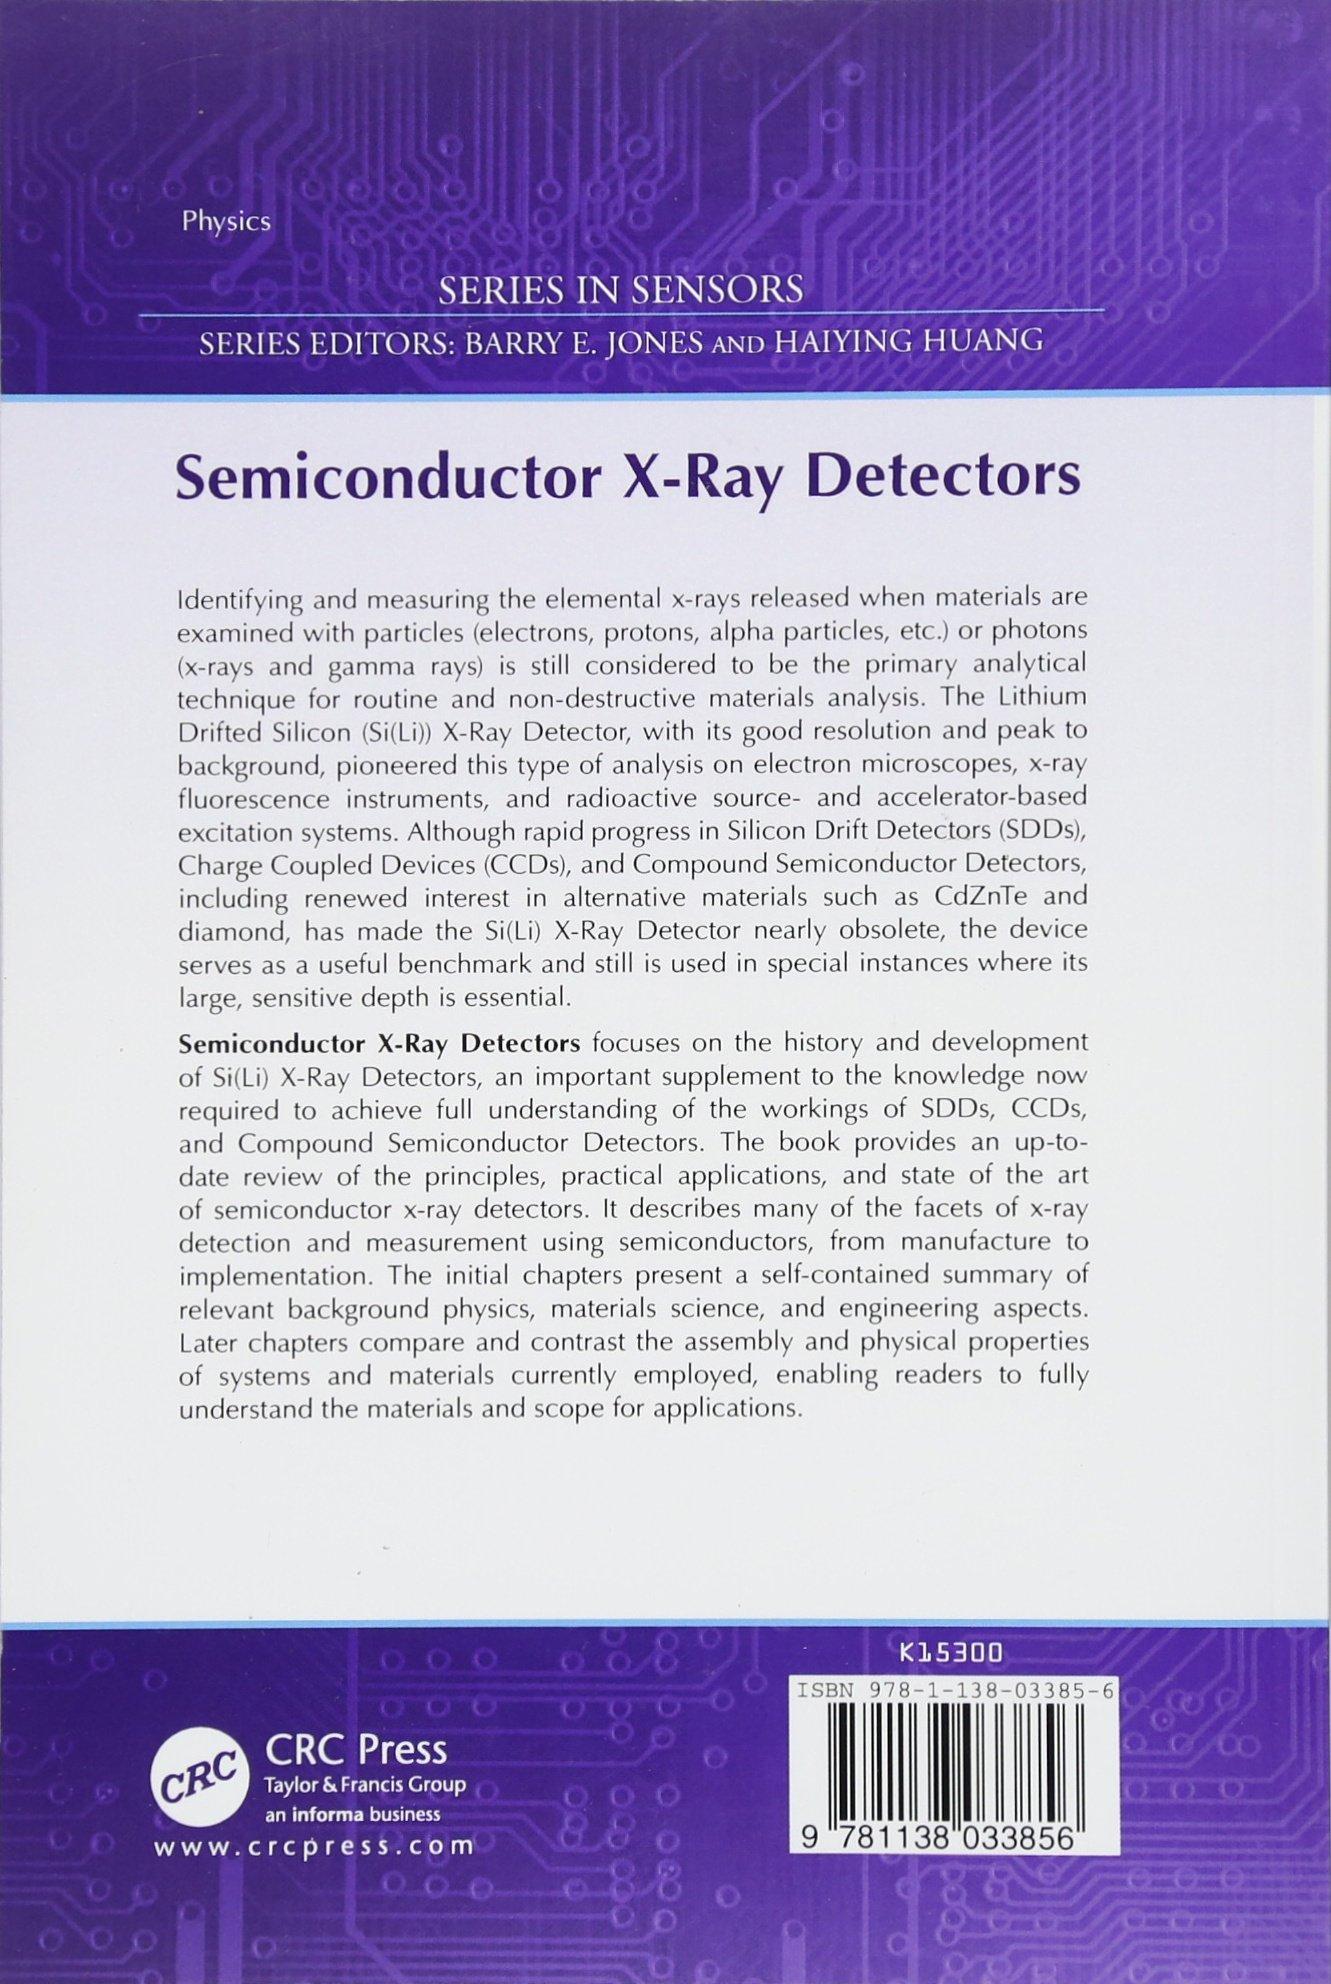 Semiconductor X-Ray Detectors (Series in Sensors): Amazon.es: B. G. Lowe, R. A. Sareen: Libros en idiomas extranjeros